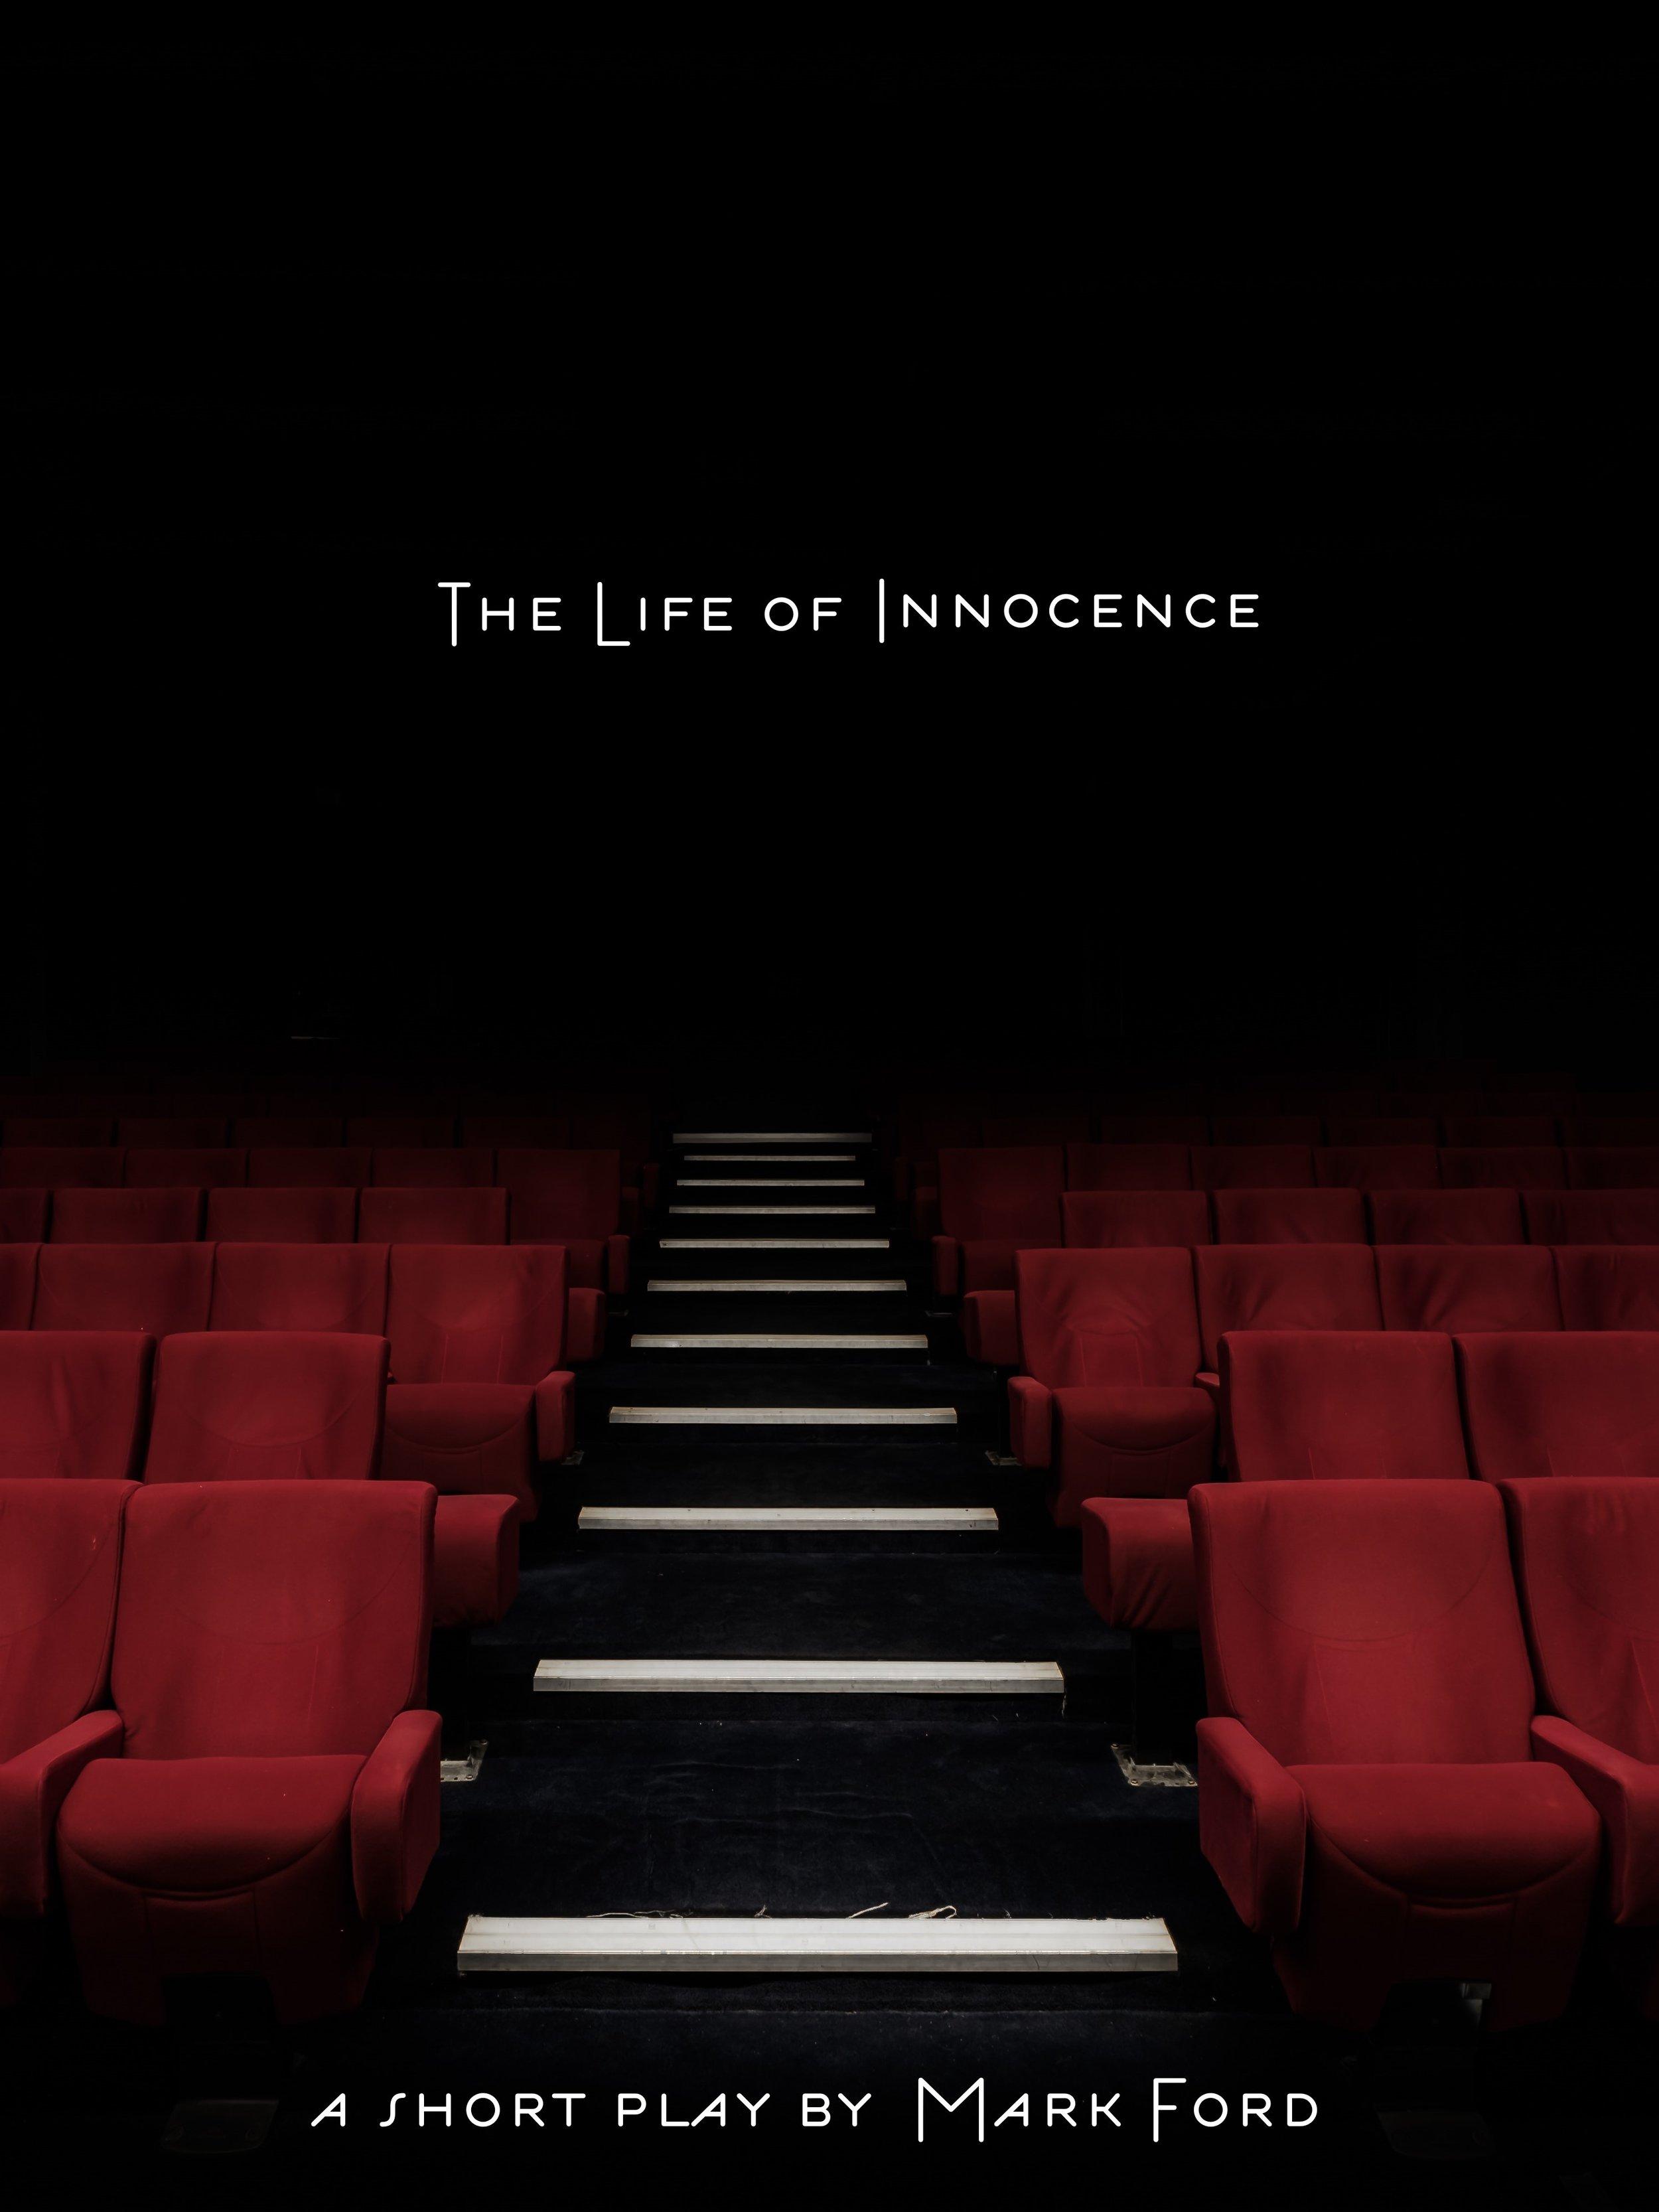 The Life Of Innocence